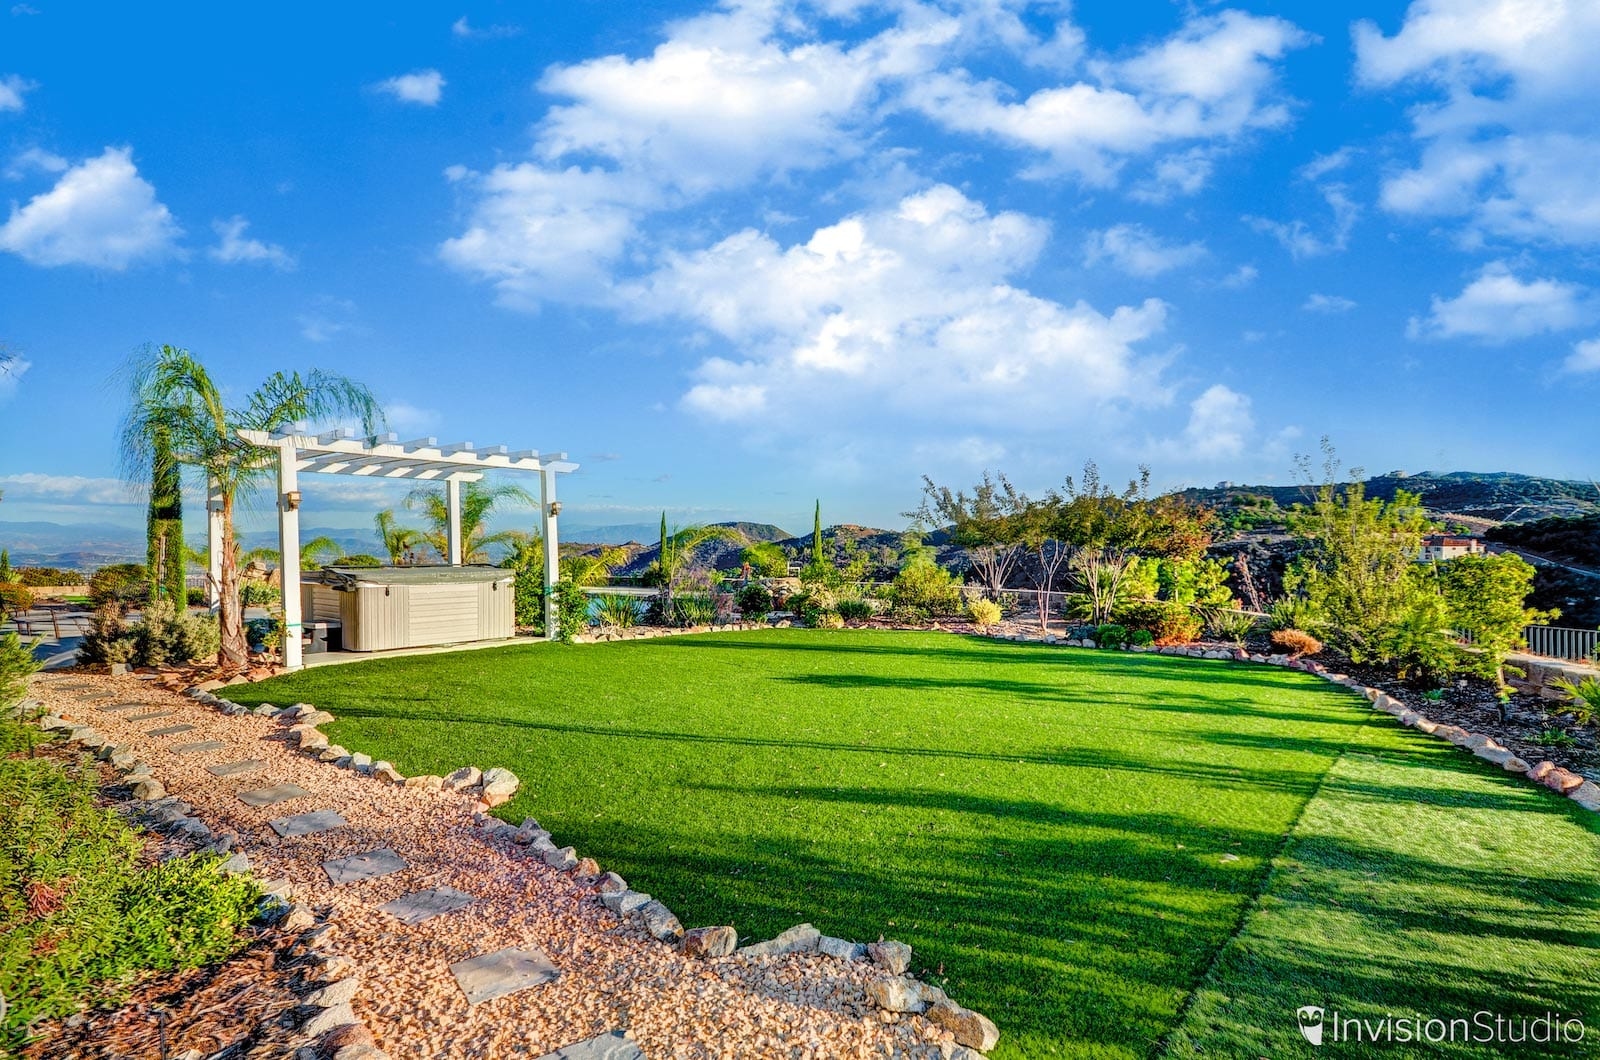 Carlsbad California Real Estate Photography | Carlsbad San Diego Virtual Tour Photographer | Carlsbad Virtual Tour Photographer